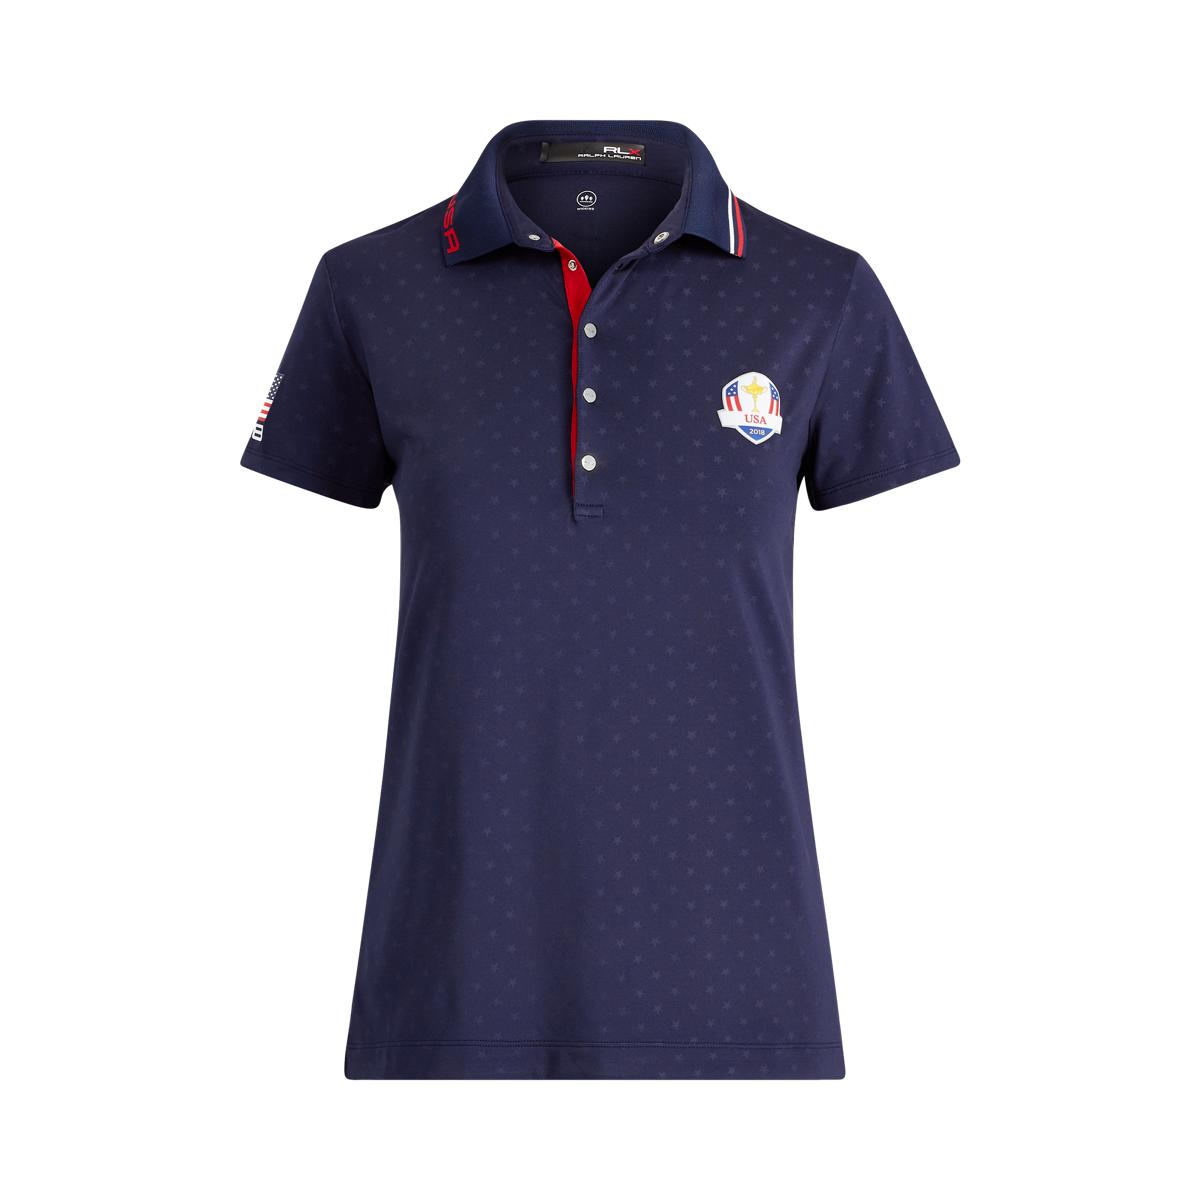 55c8fbf53e3b8 U.S. Ryder Cup Team Polo Shirt